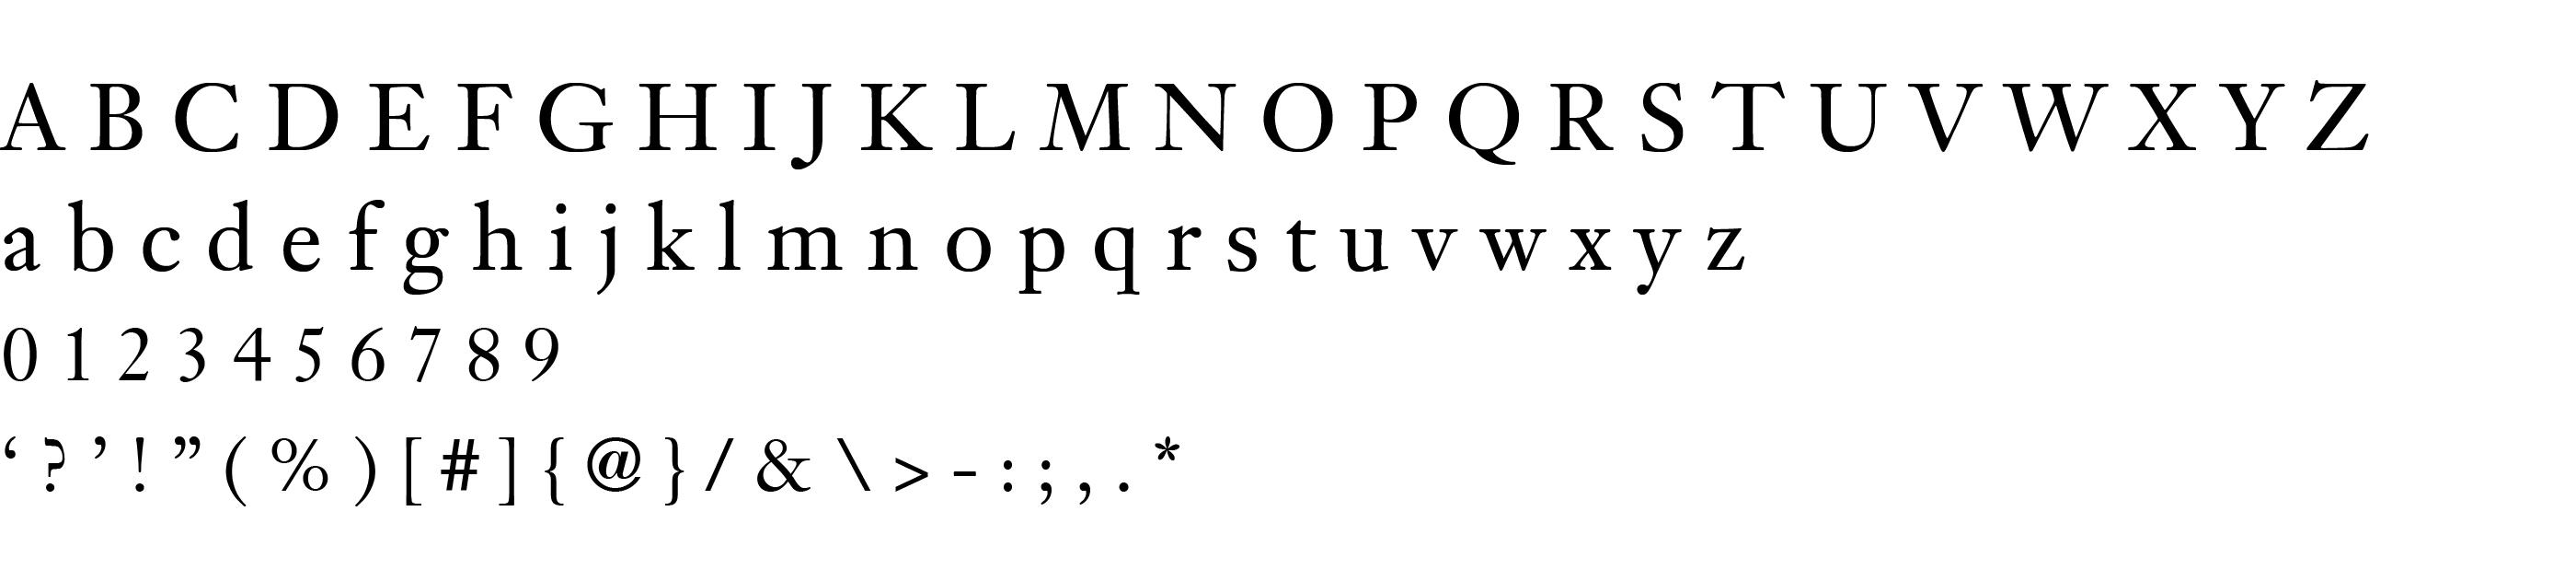 Type Specimen Janson LT